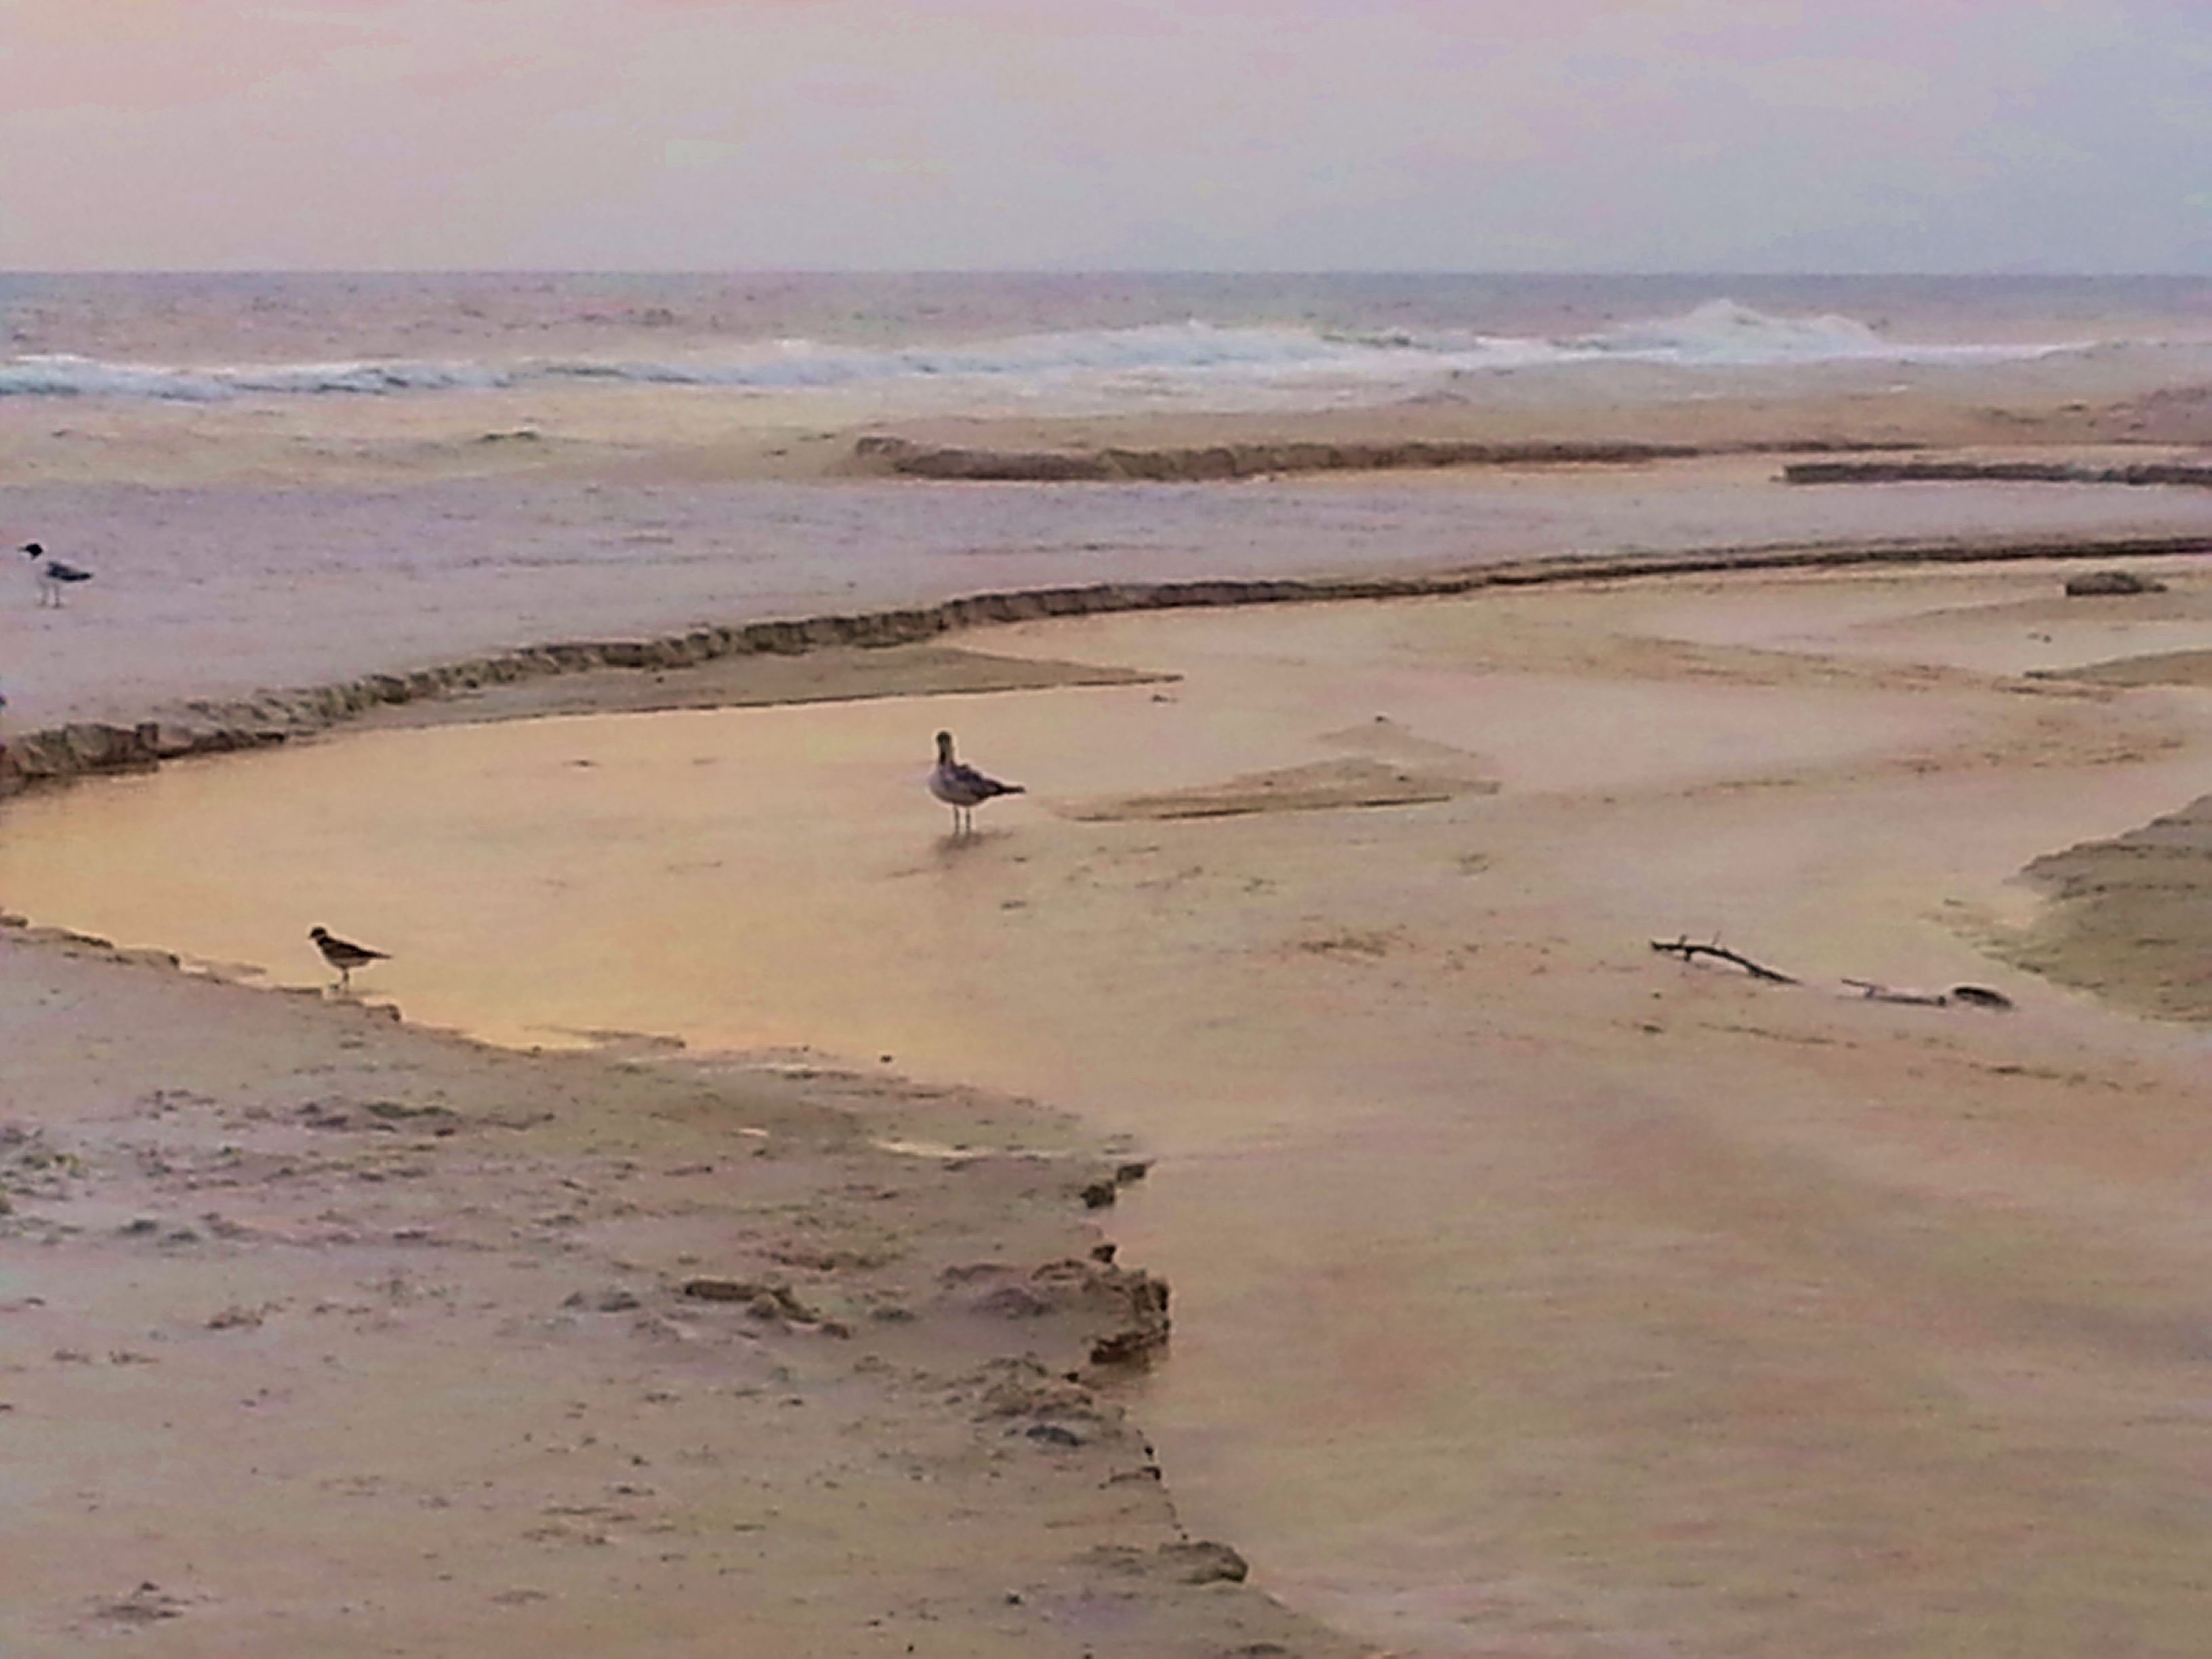 5 9 14 T Laguna Beach On The Gulf Of Mexico Panama City Beach Florida Panama City Panama Panama City Beach City Beach